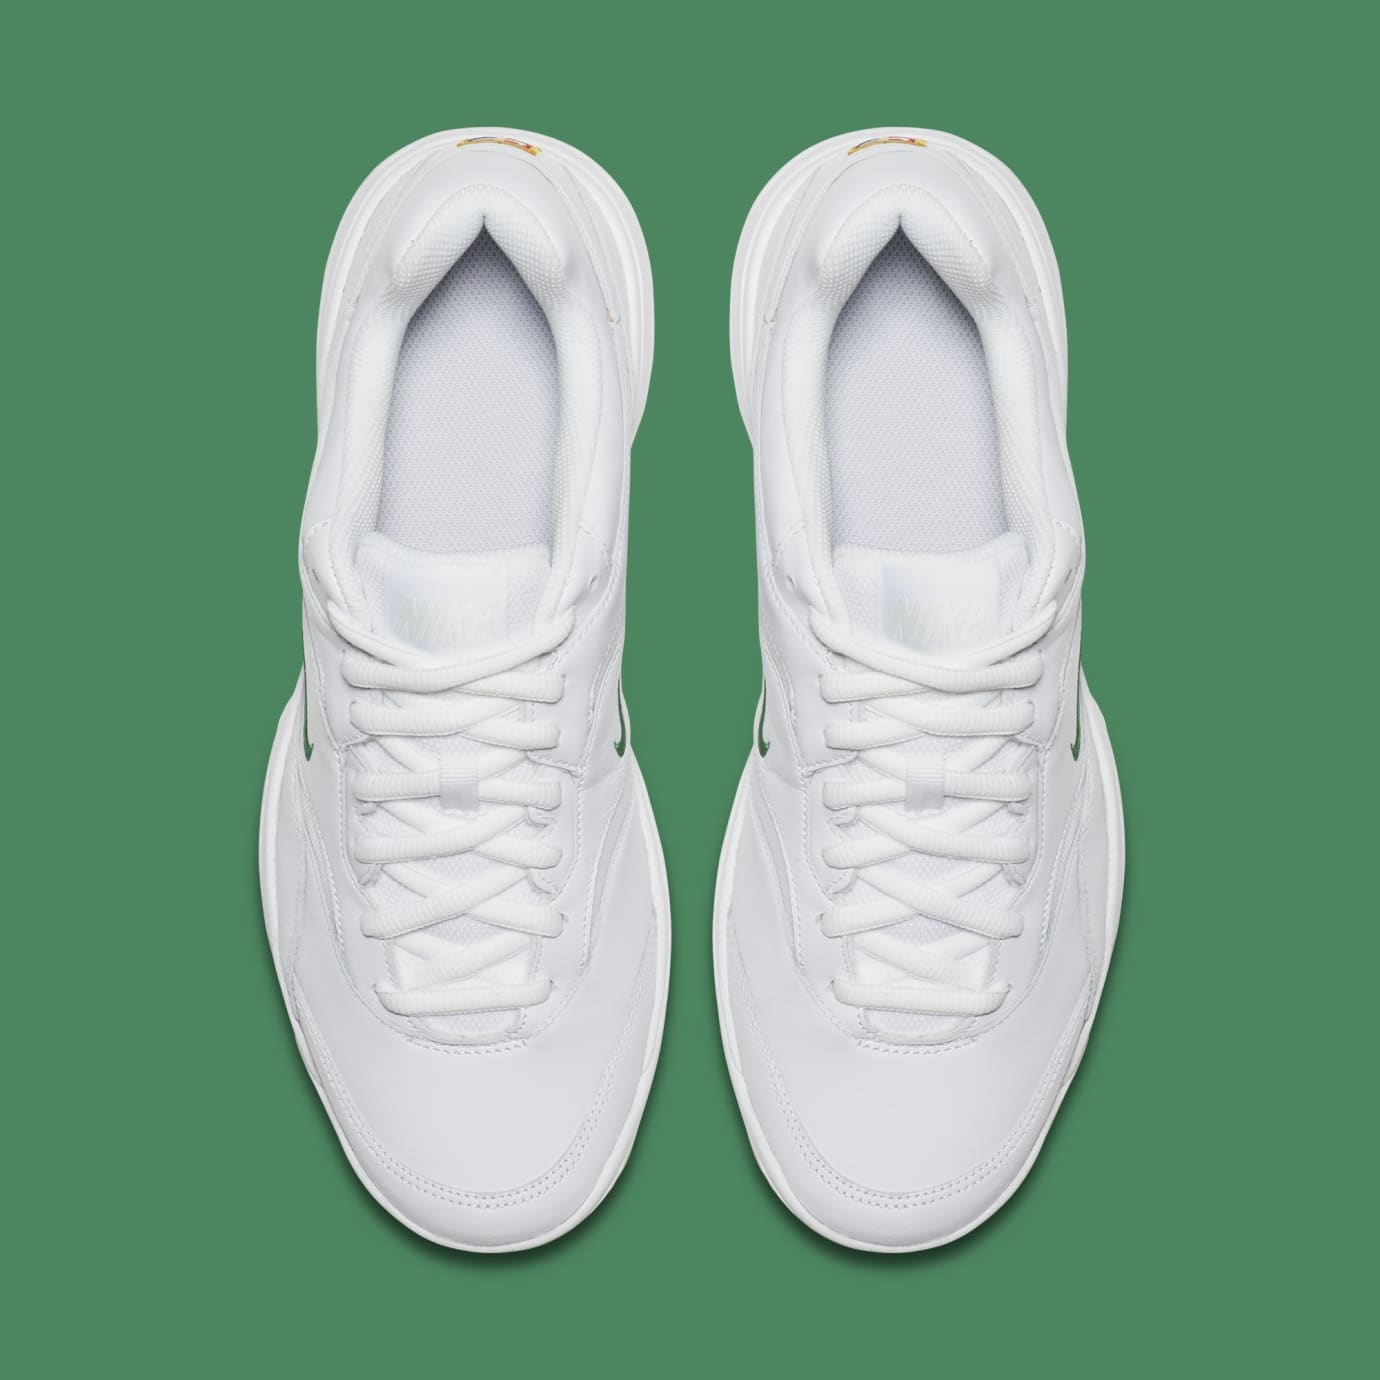 NikeCourt Court Lite 'London' AR6342-101 (Top)